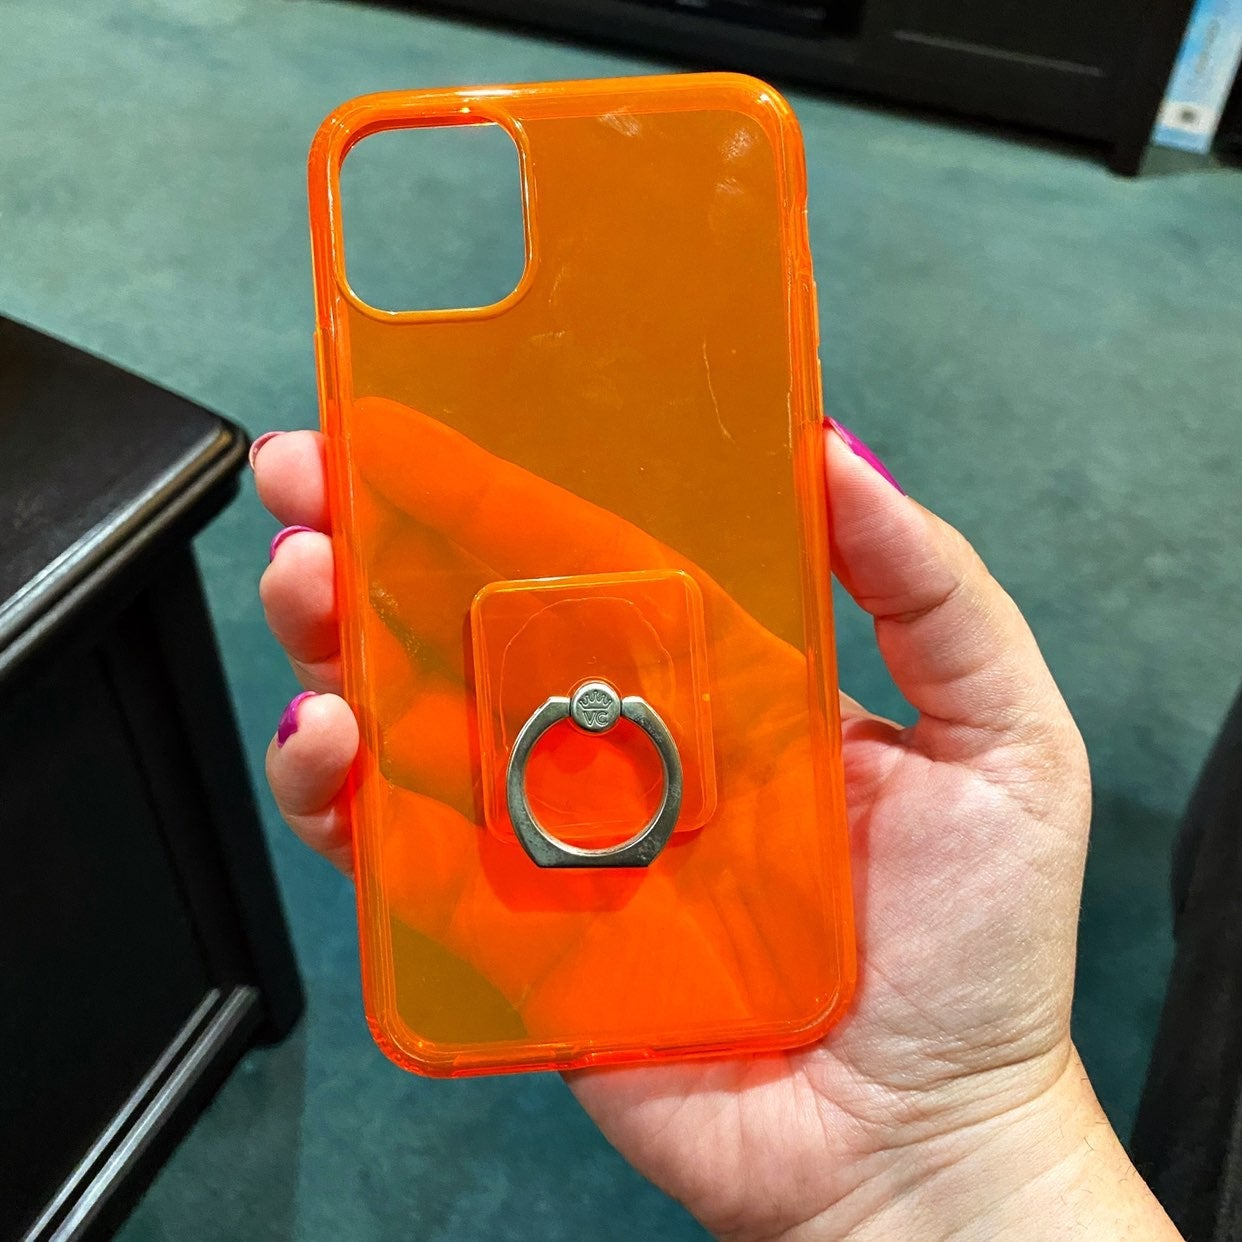 Velvet Caviar Neon Orange iPhone Case